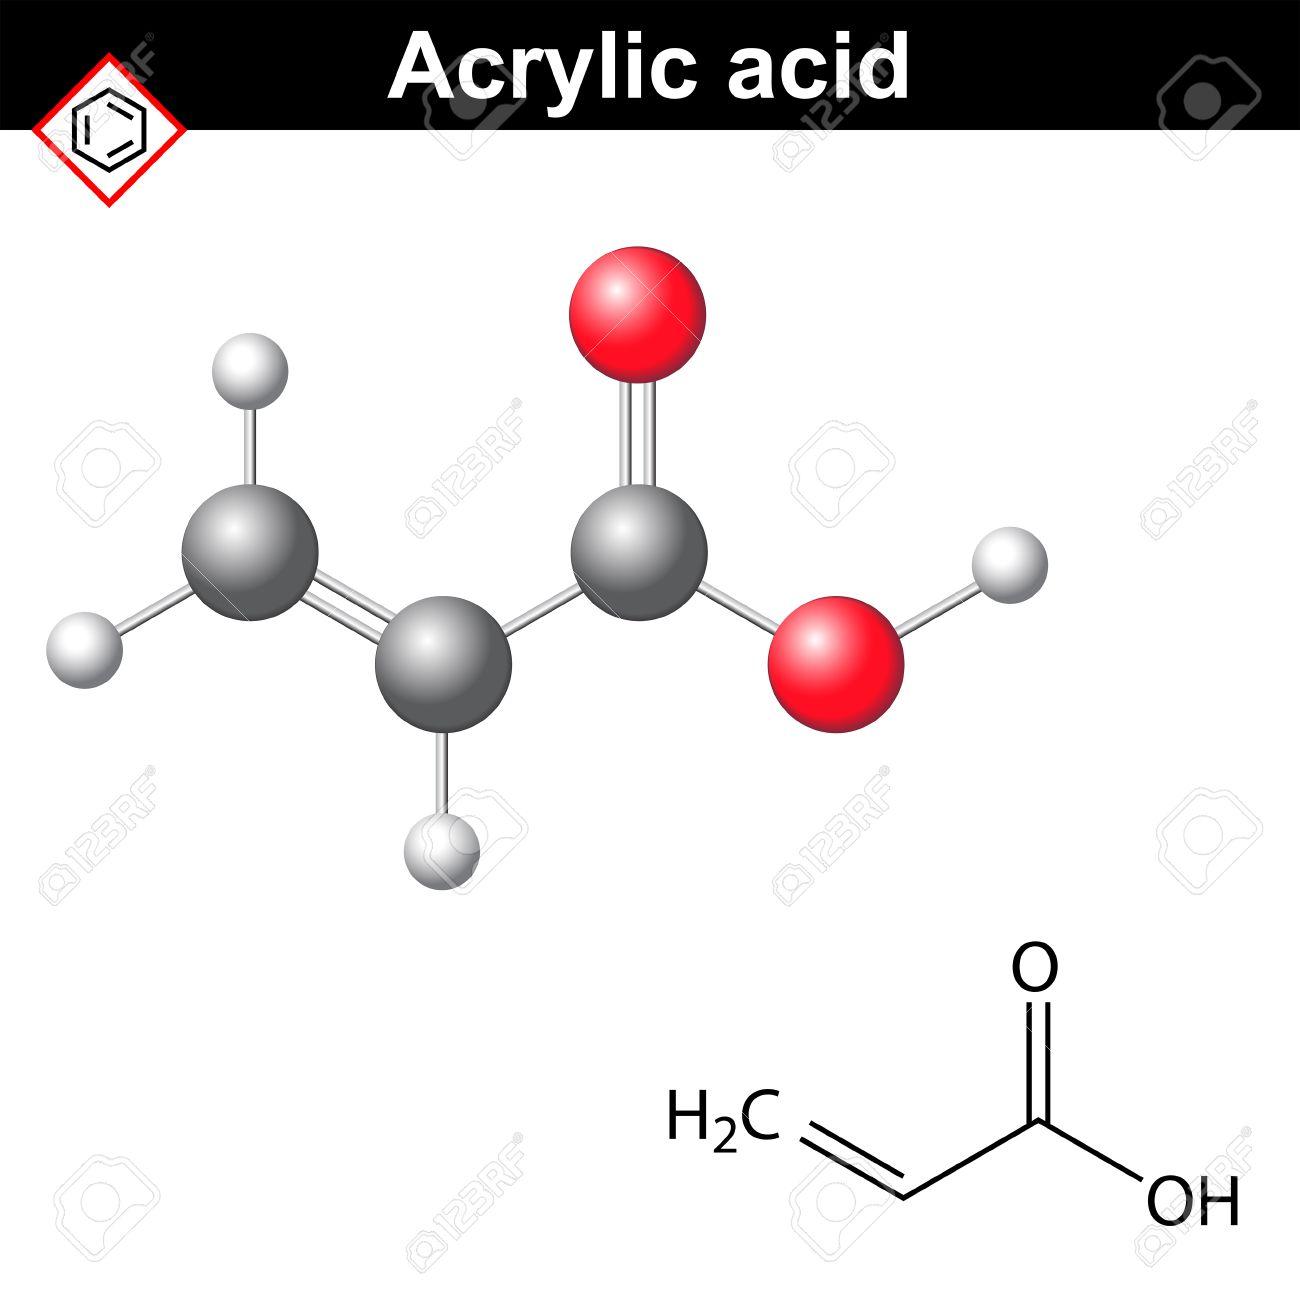 acrylic acid molecule 2d and 3d illustration of molecular structure